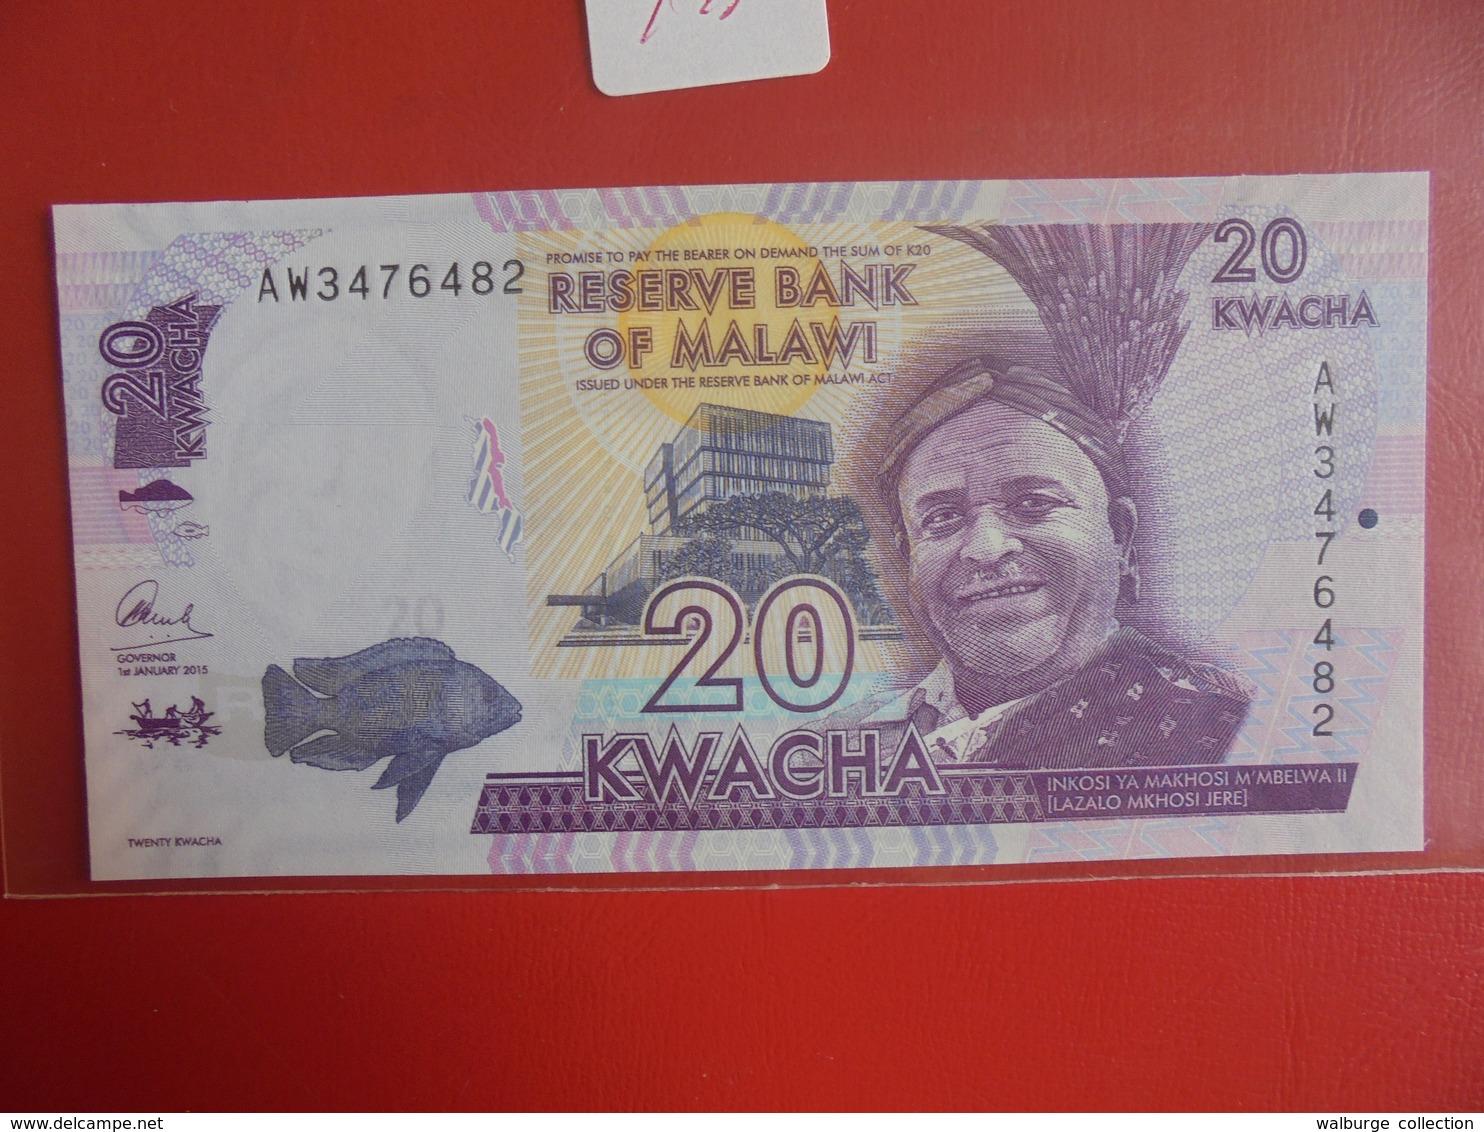 MALAWI 20 KWACHA 2015 PEU CIRCULER/NEUF - Malawi